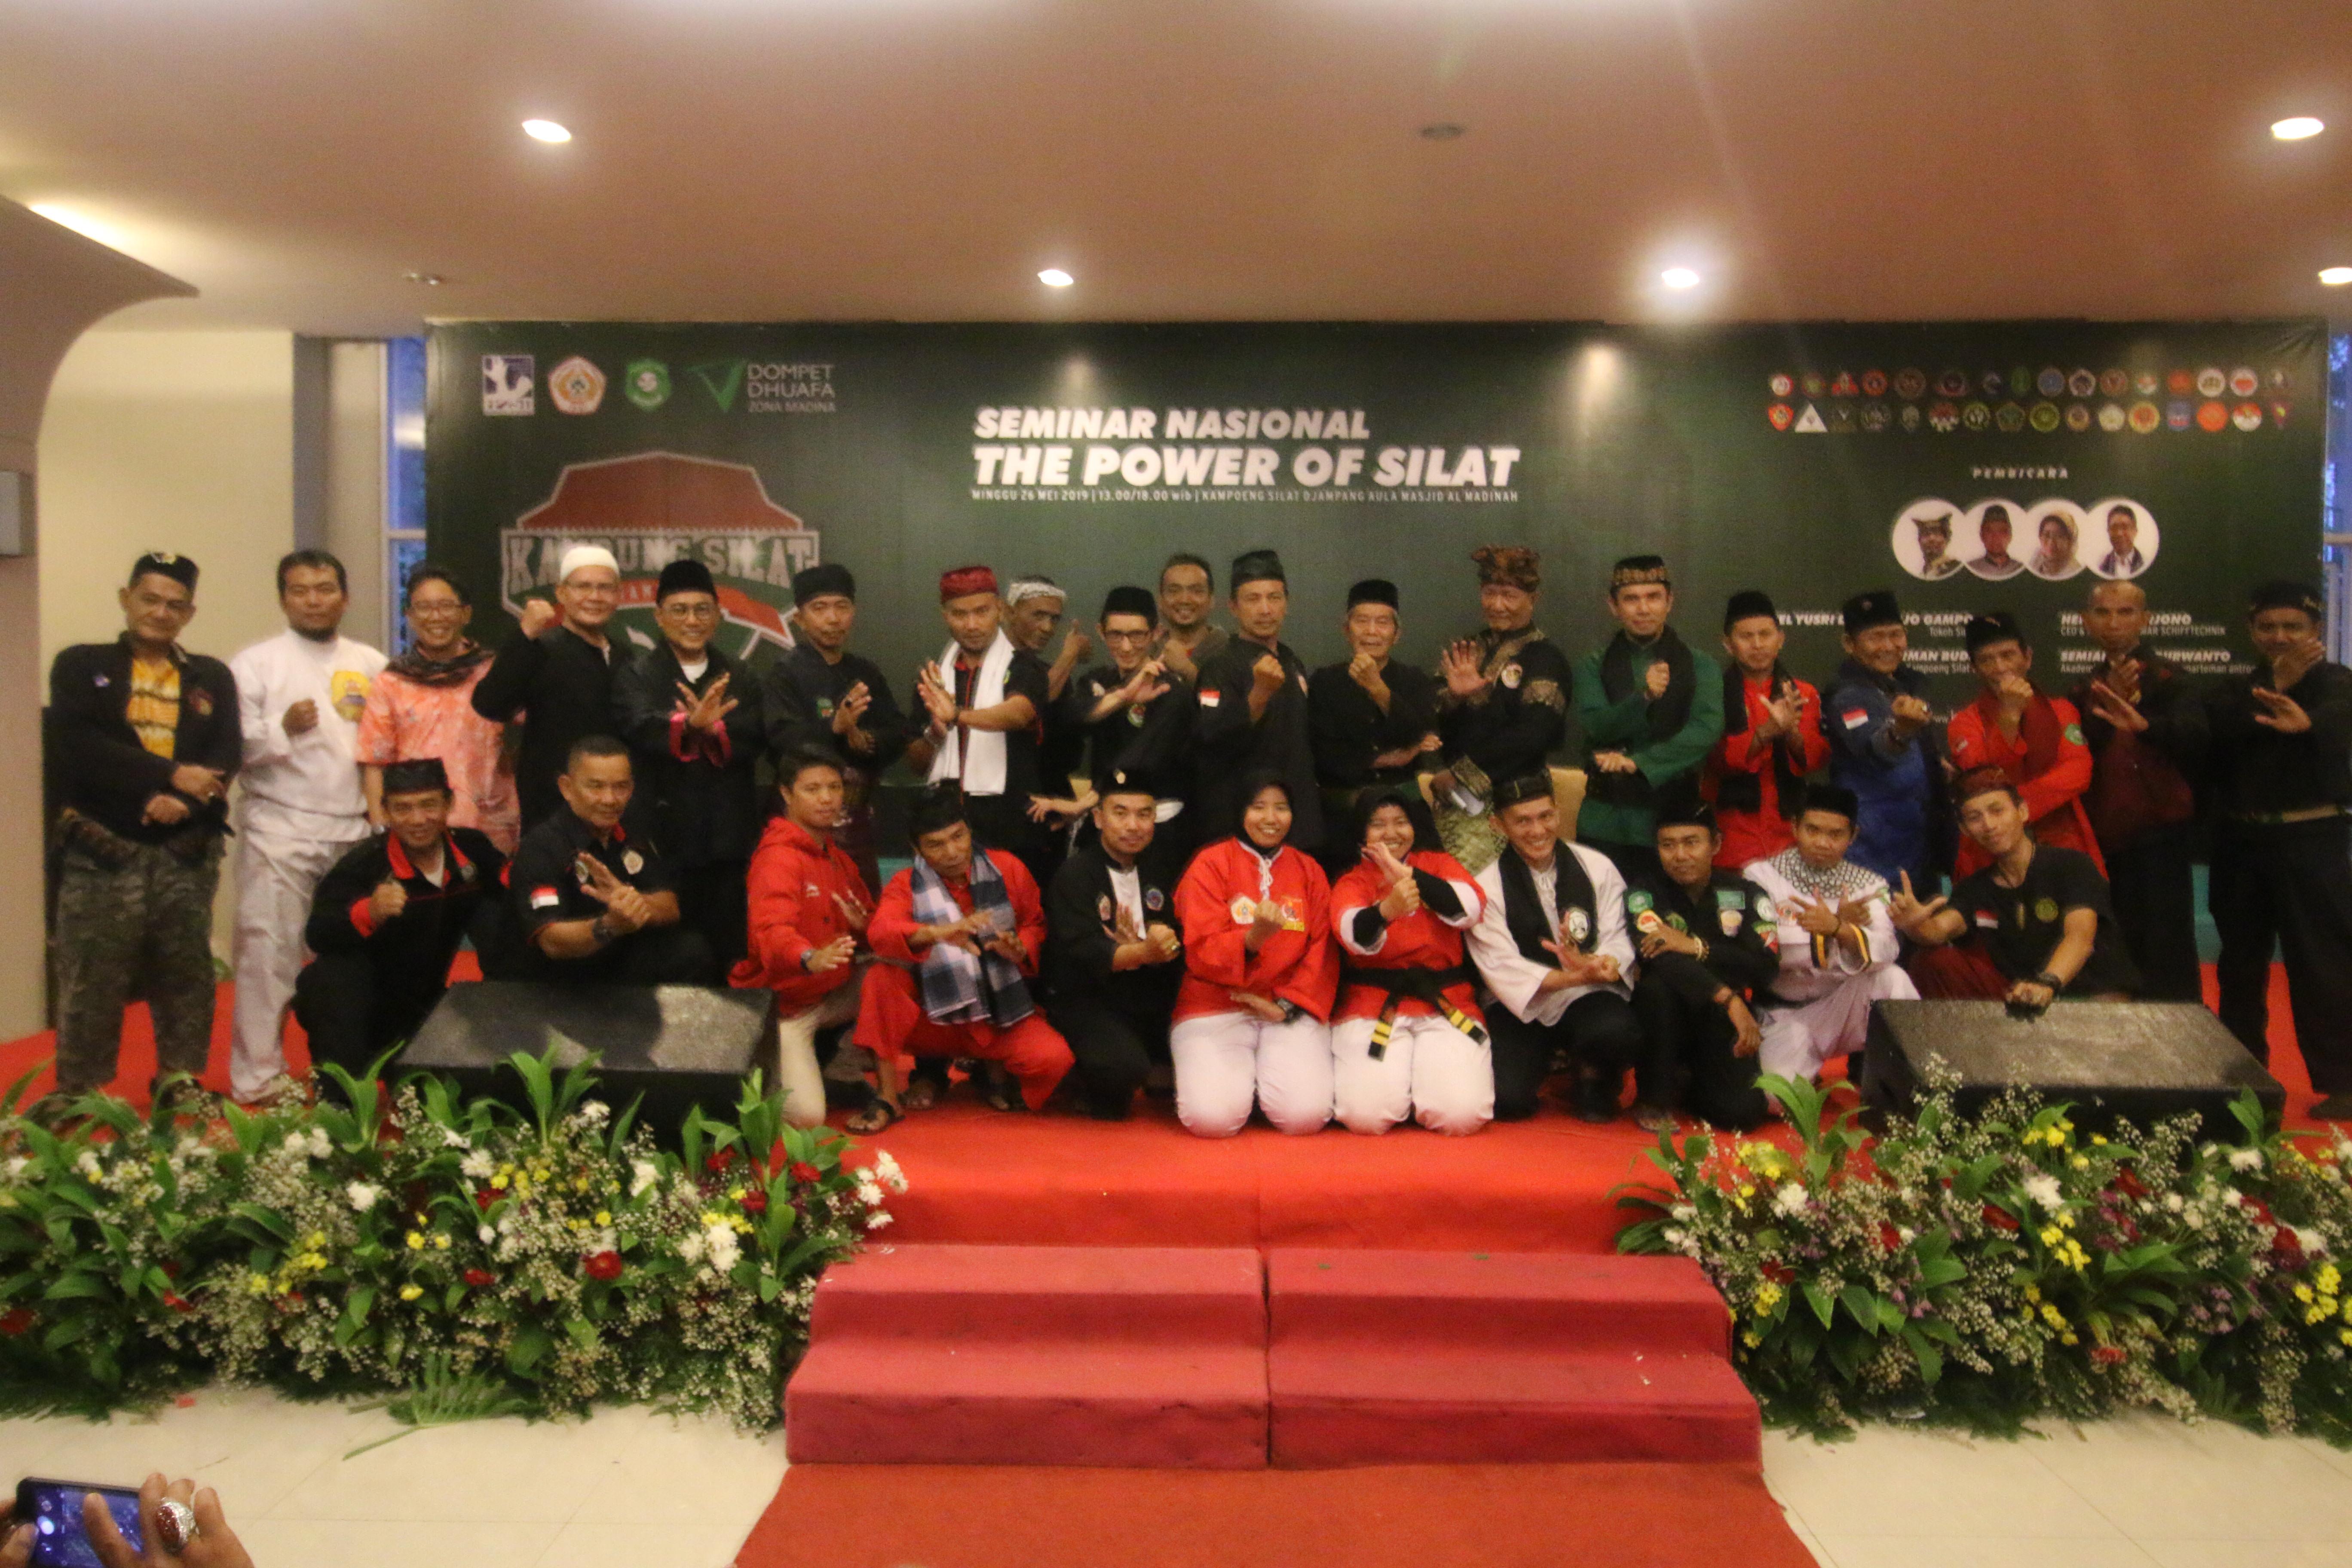 400 Pendekar Silat Ikuti Seminar Nasional The Power Of Silat